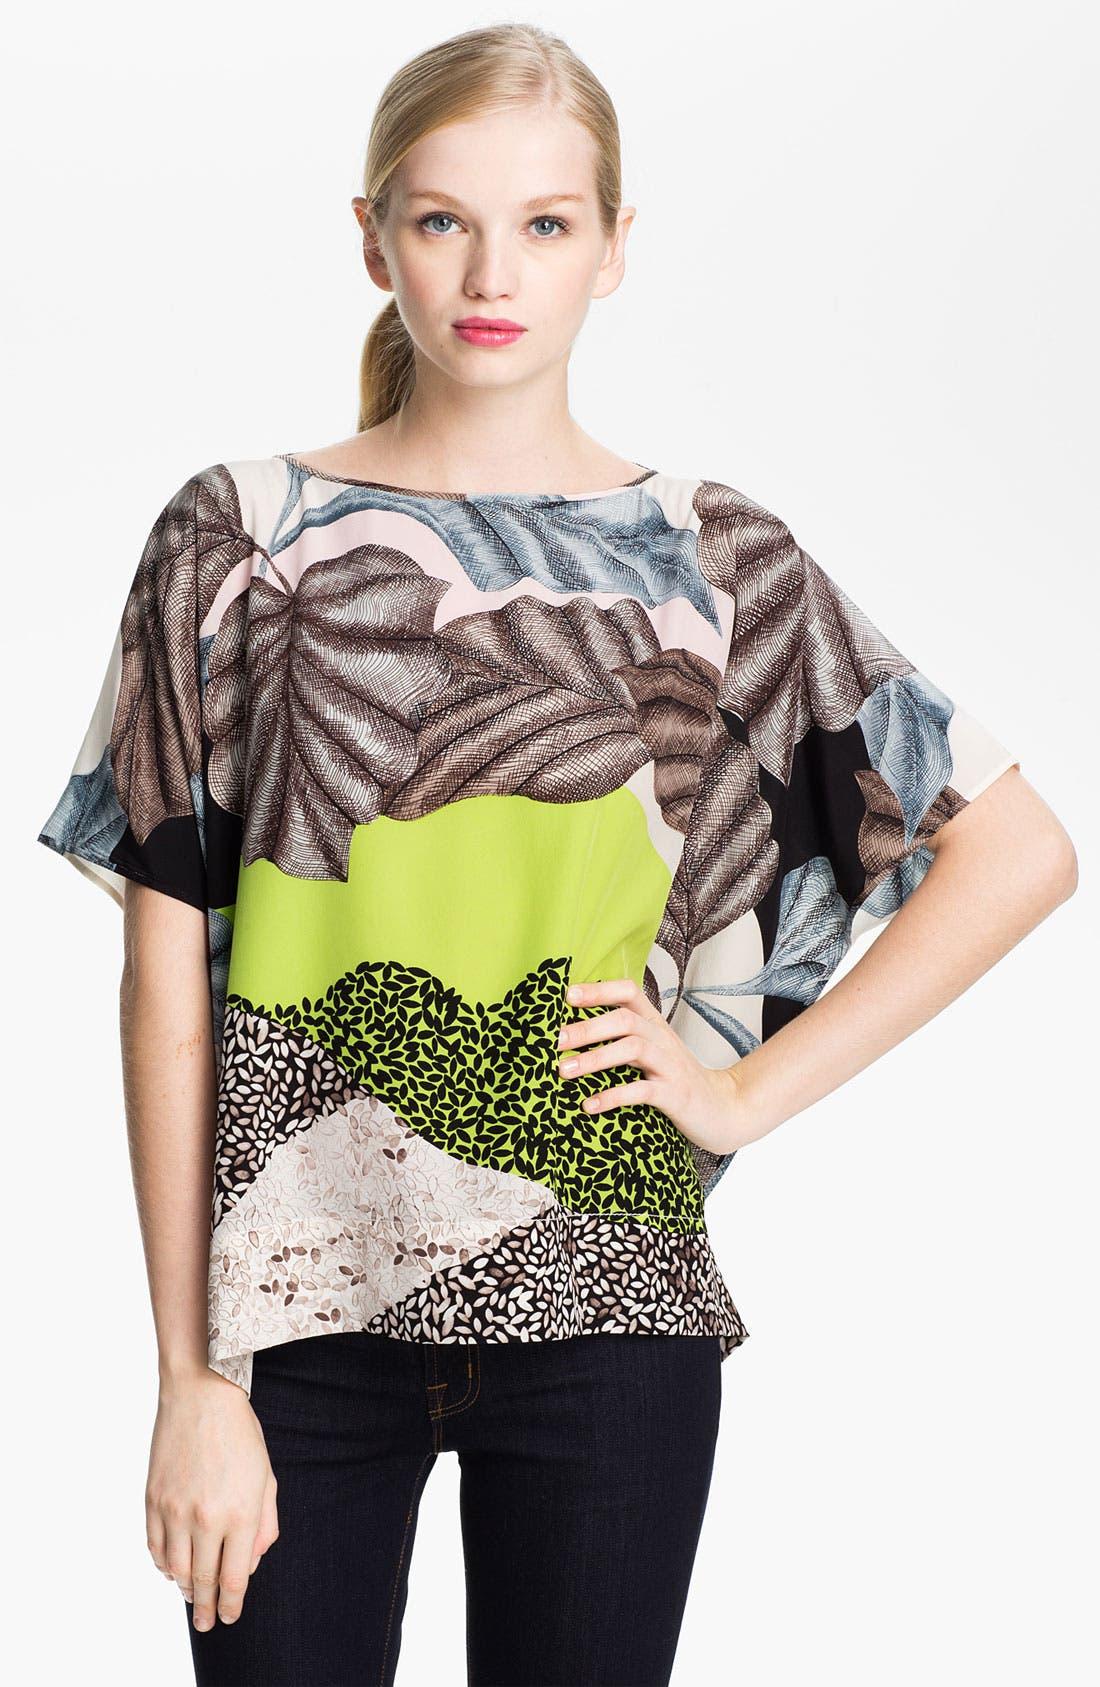 Alternate Image 1 Selected - Diane von Furstenberg 'New Hanky' Silk Top